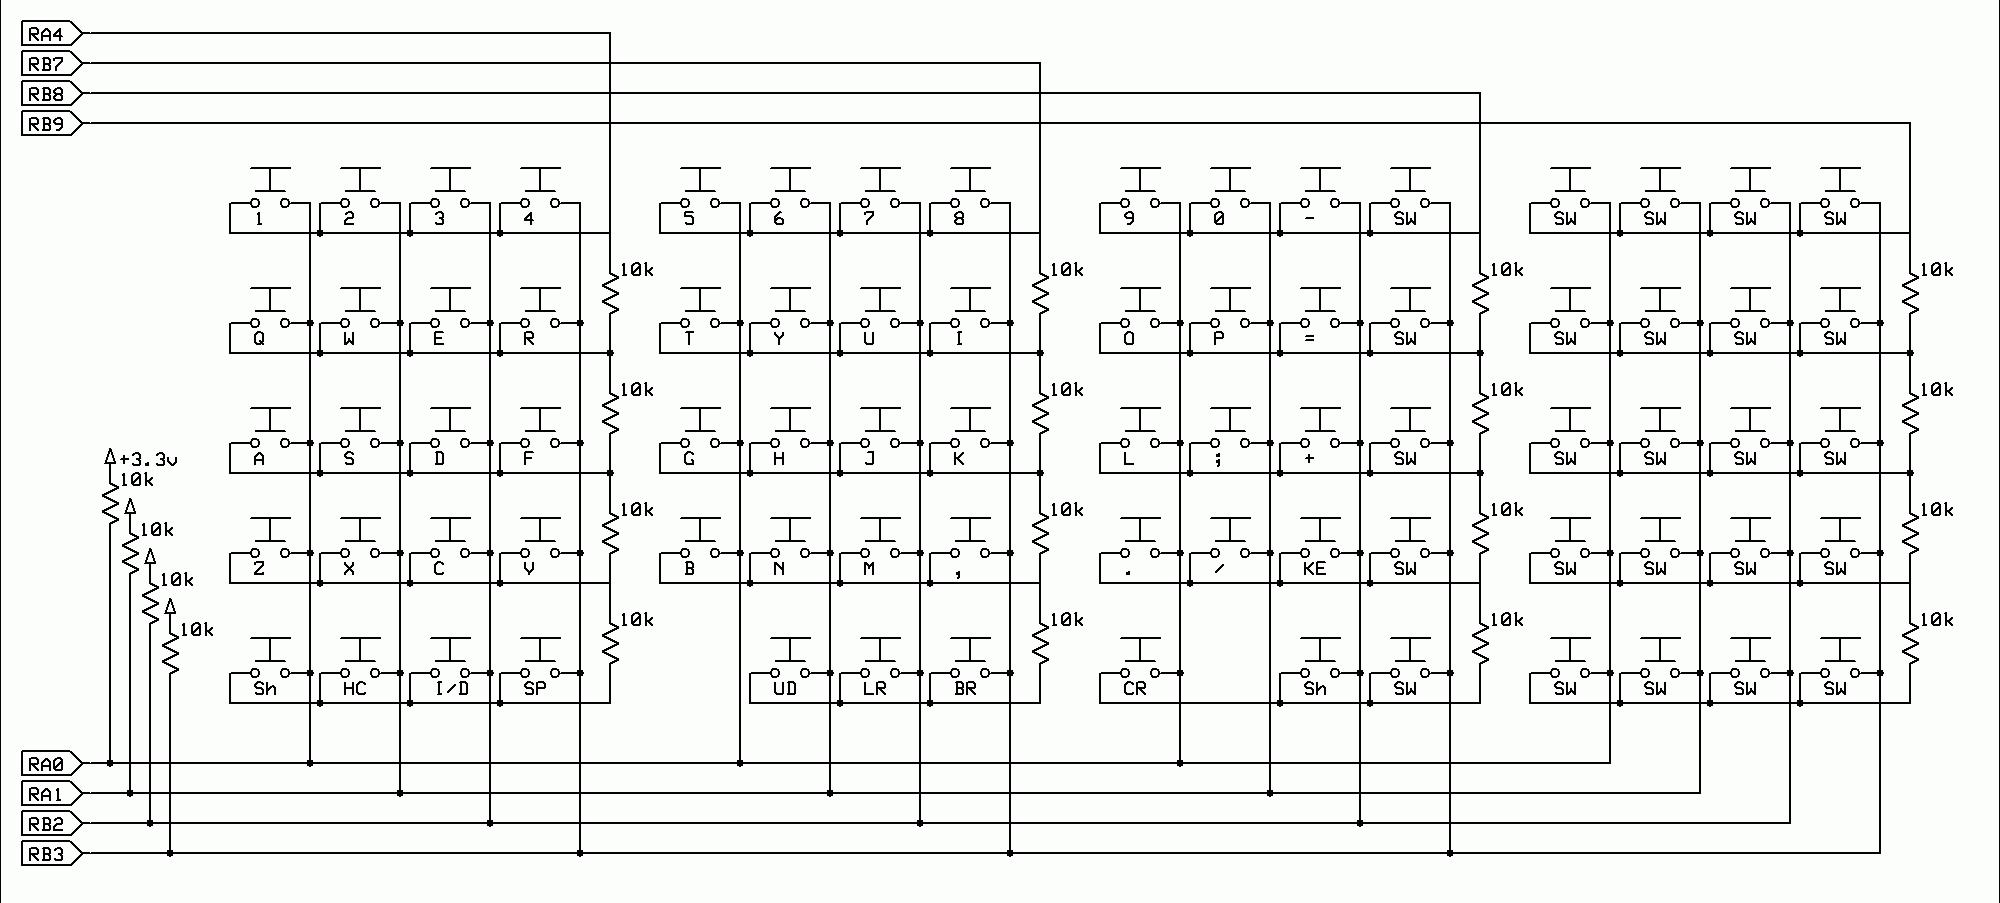 2019-09-23-schematics2.png